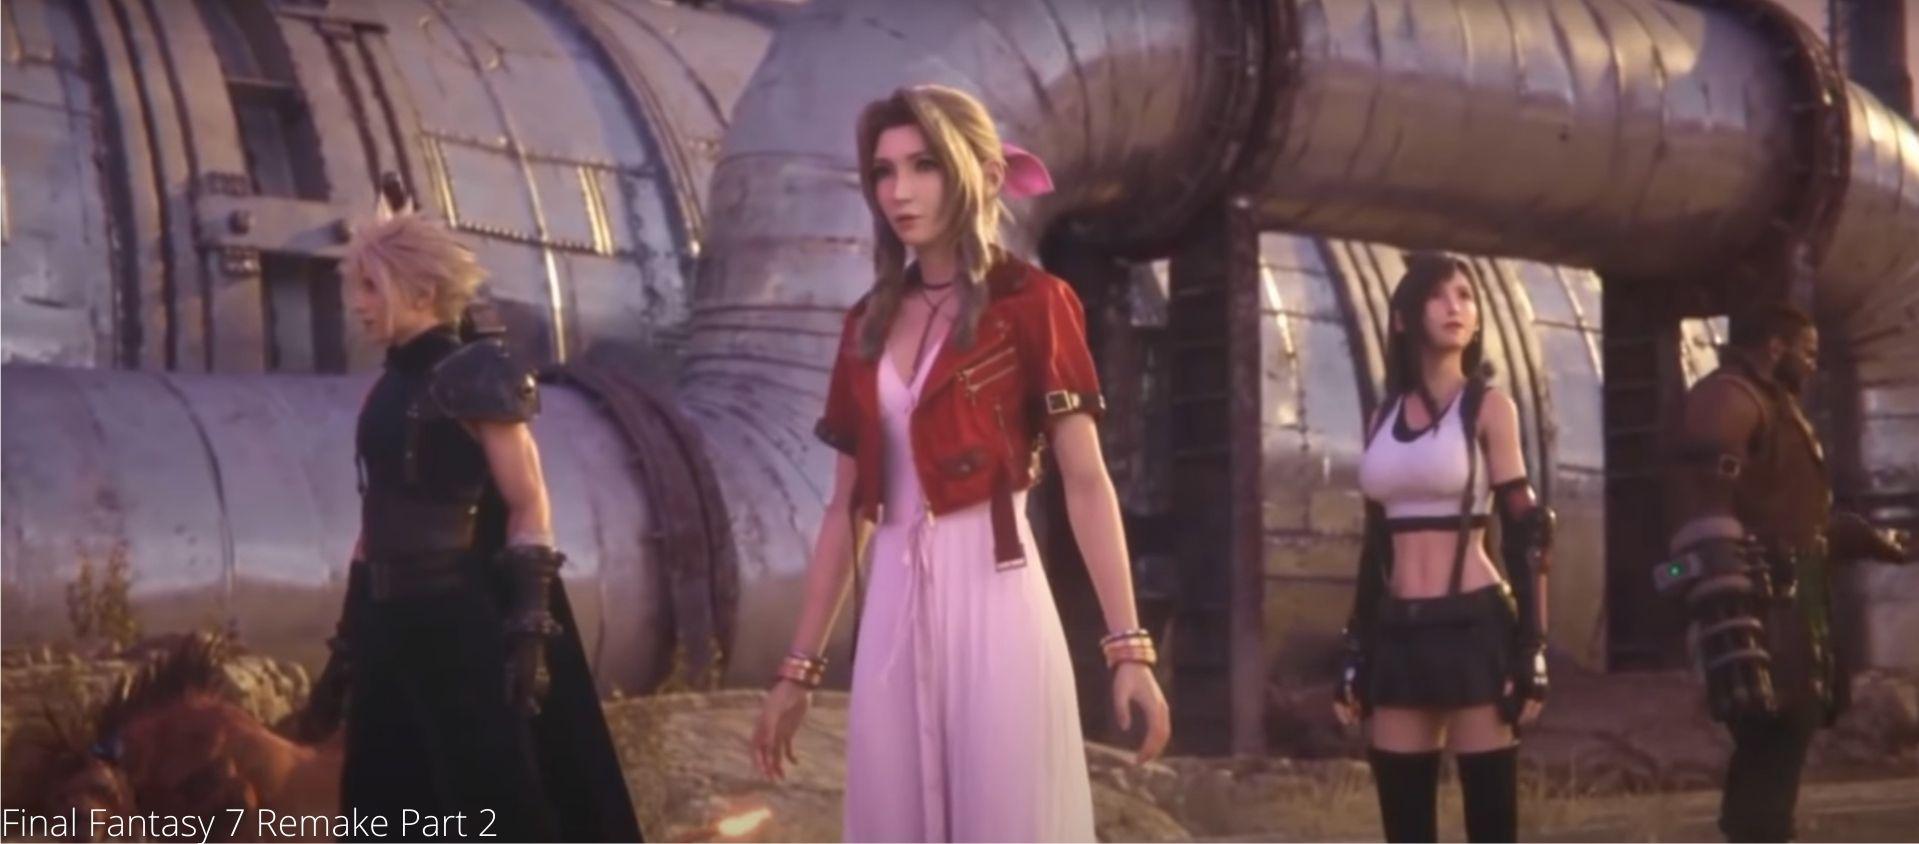 Final Fantasy 7 Remake Part